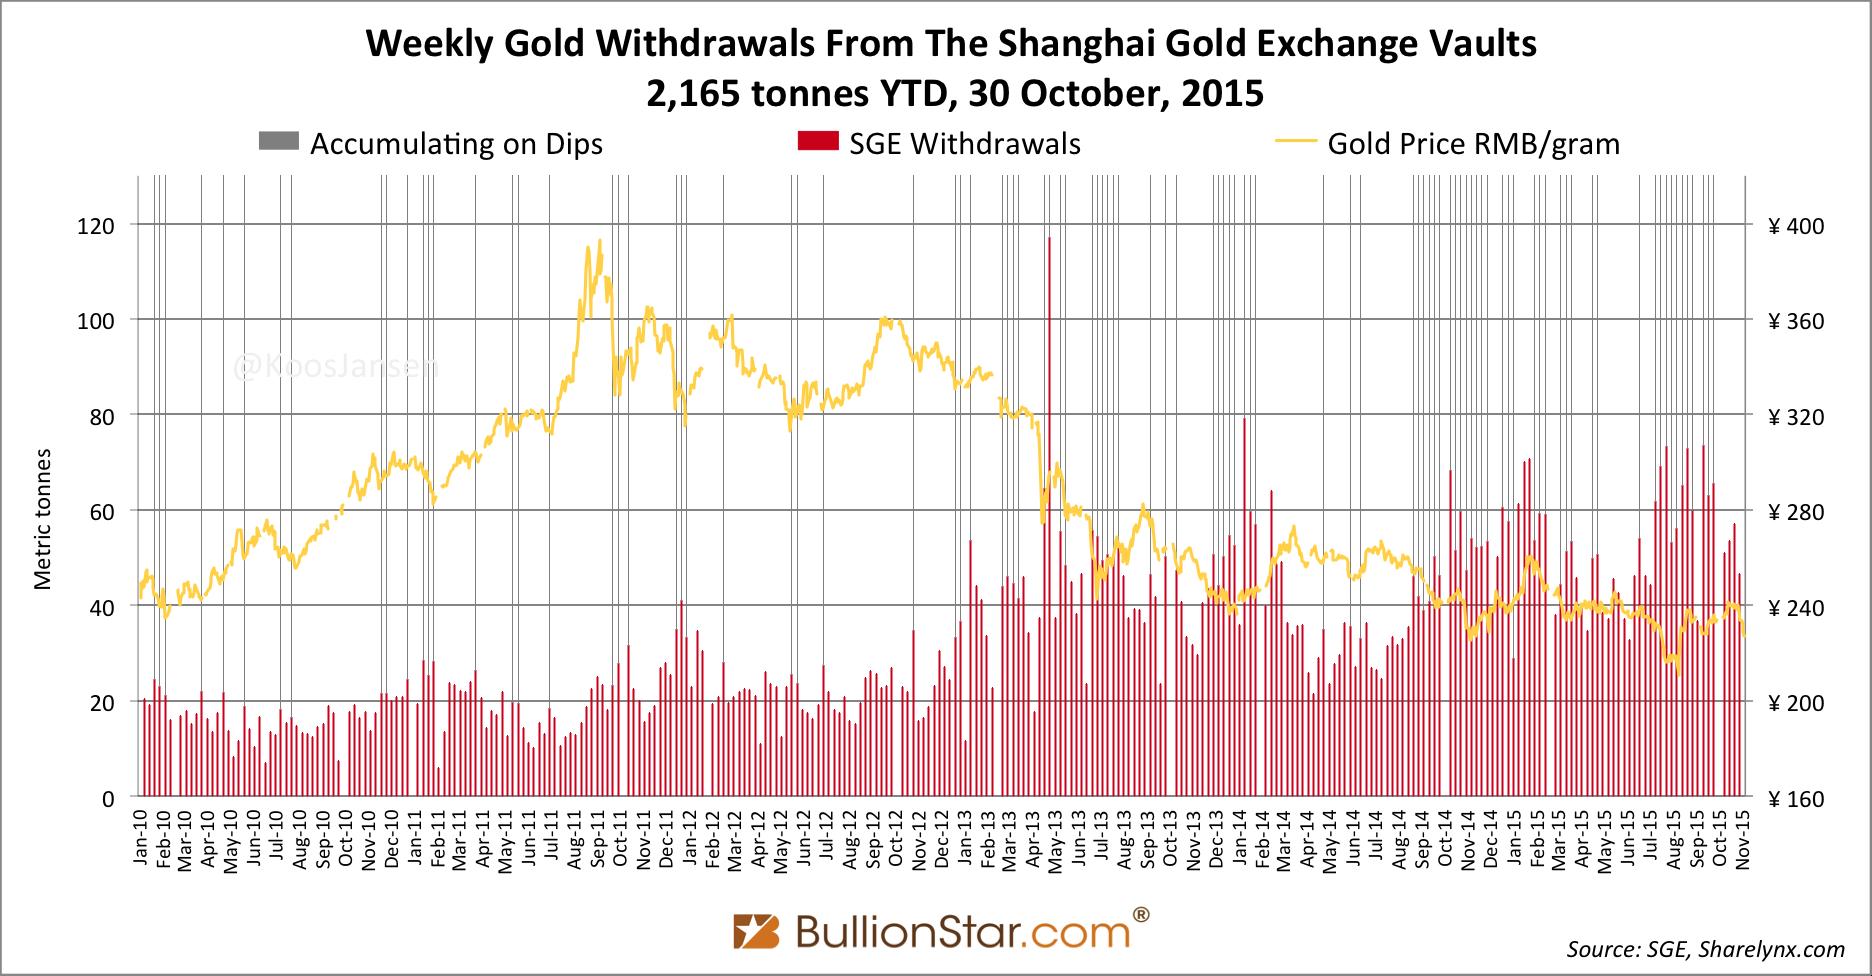 Shanghai Gold Exchange Sge Withdrawals Delivery 2017 Week 42